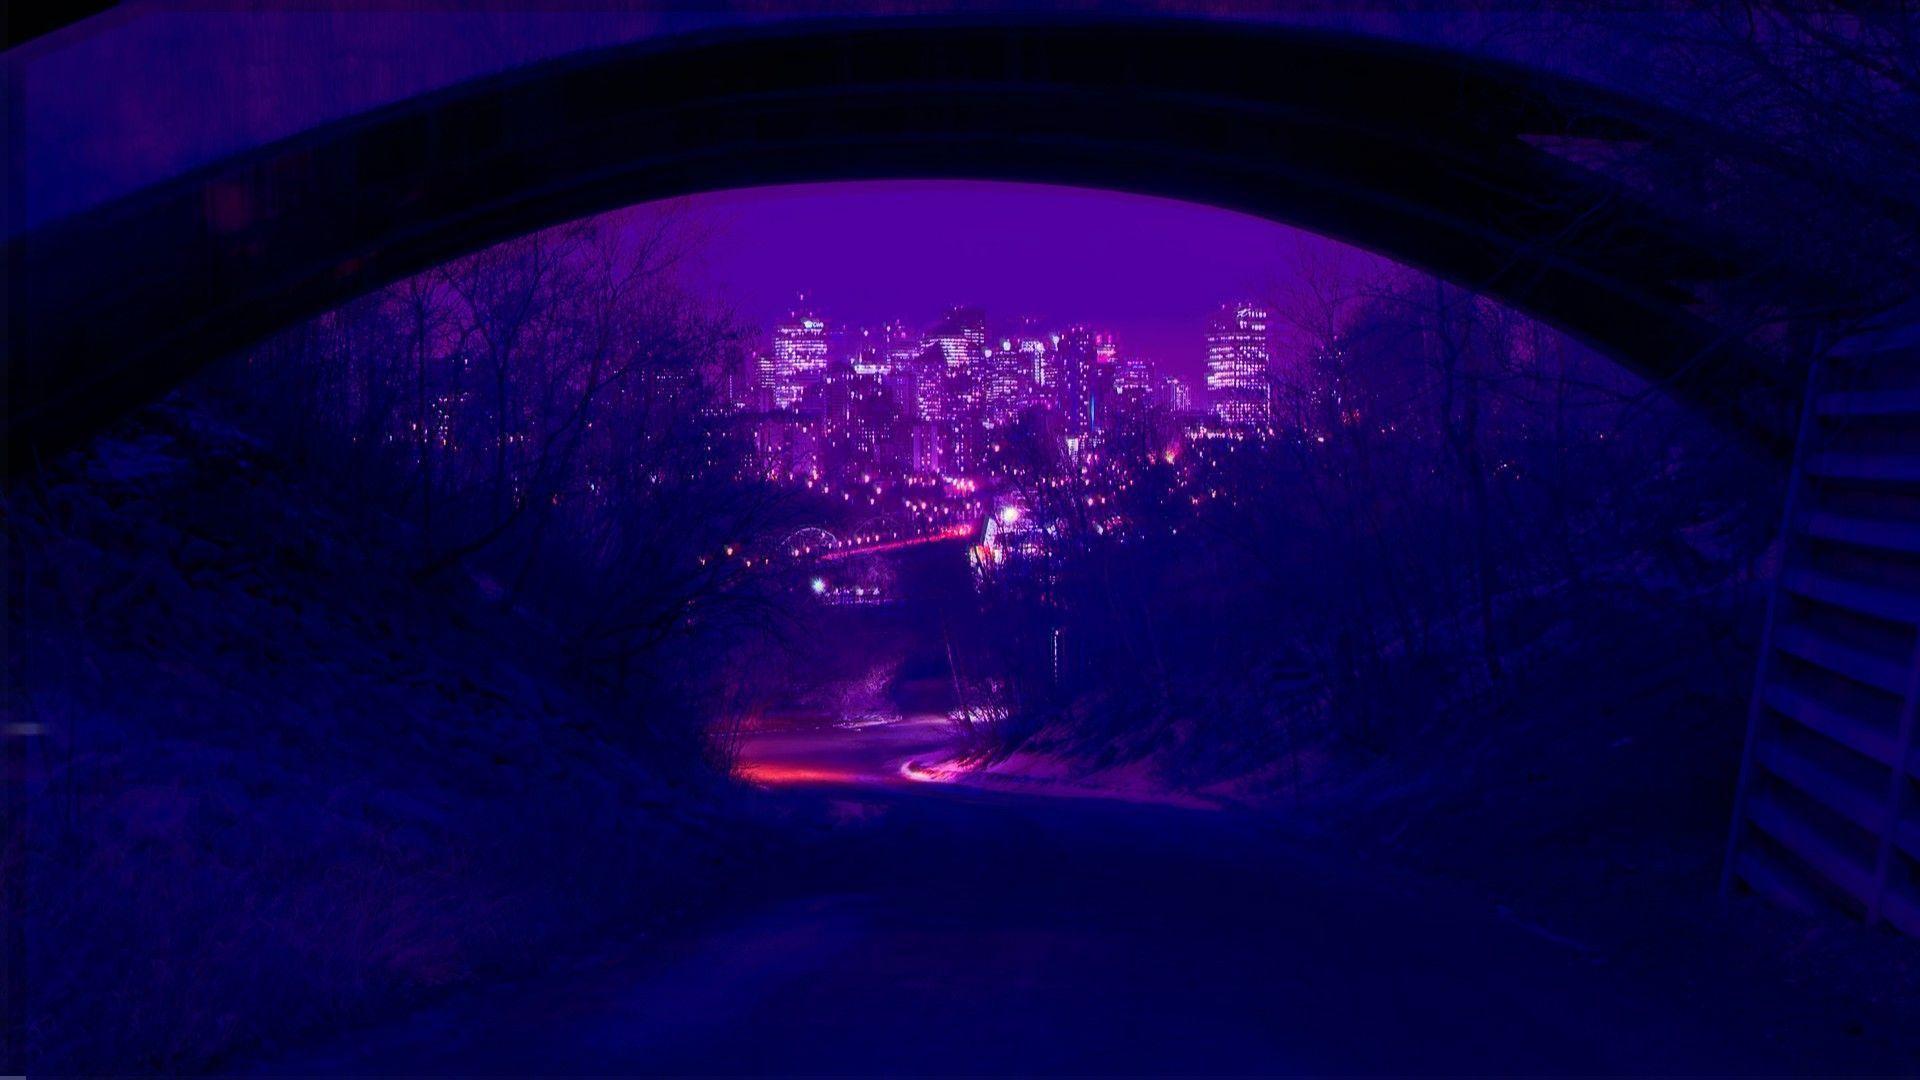 Purple Grunge Aesthetic Desktop Wallpapers Top Free Purple